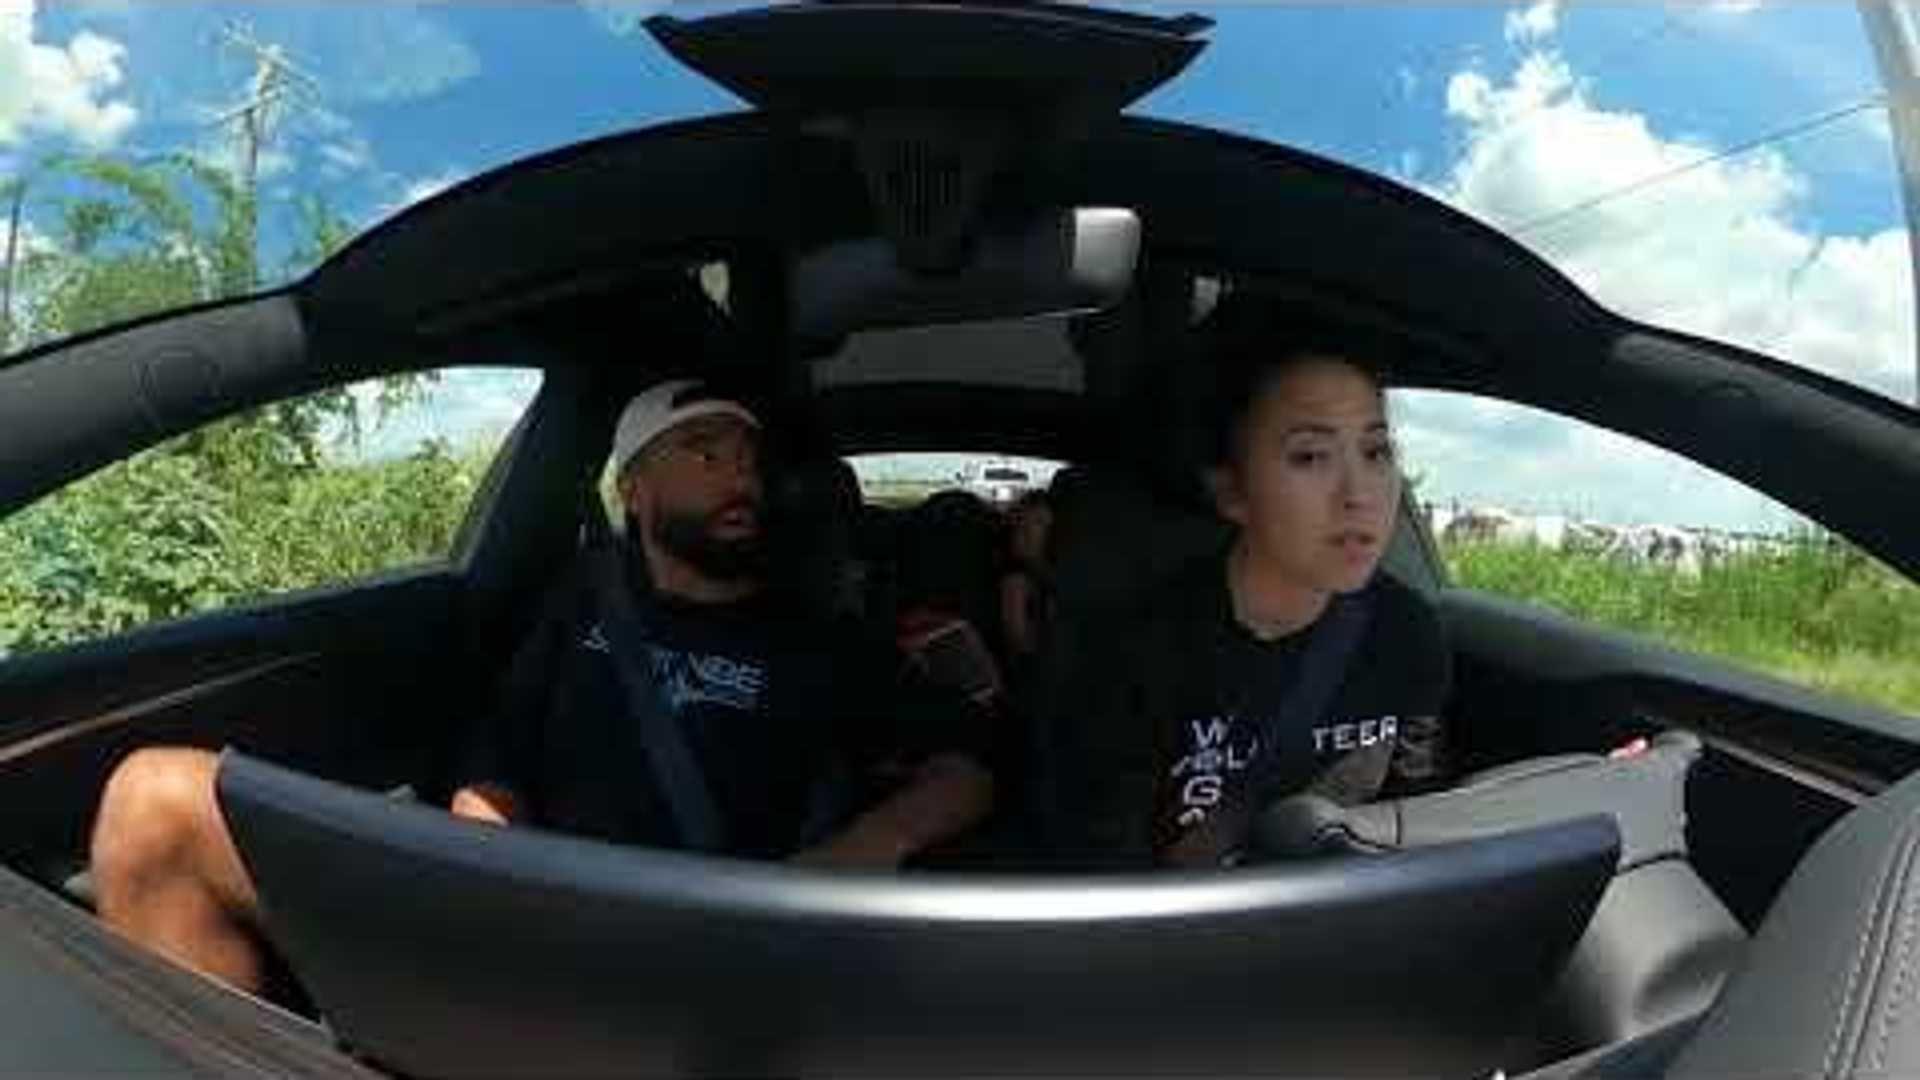 Tesla Model S Plaid's eerste gezinsrit: onbetaalbare feedback